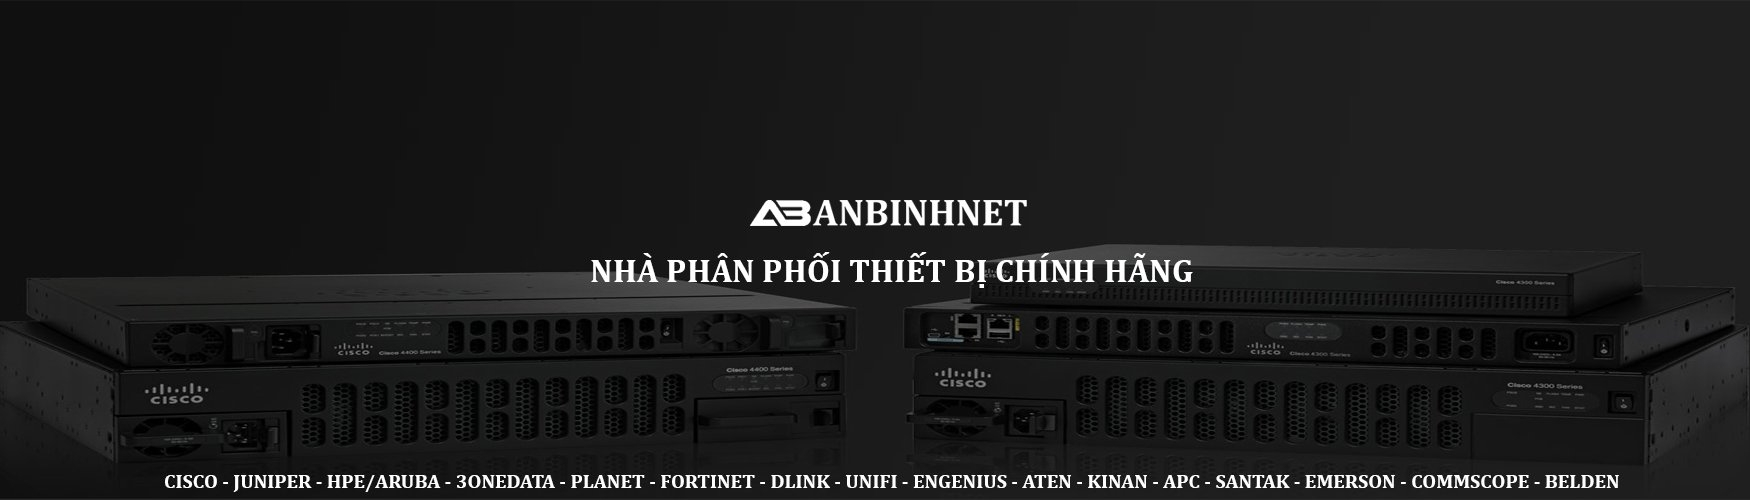 ANBINHNET (@anbinhnet) Cover Image